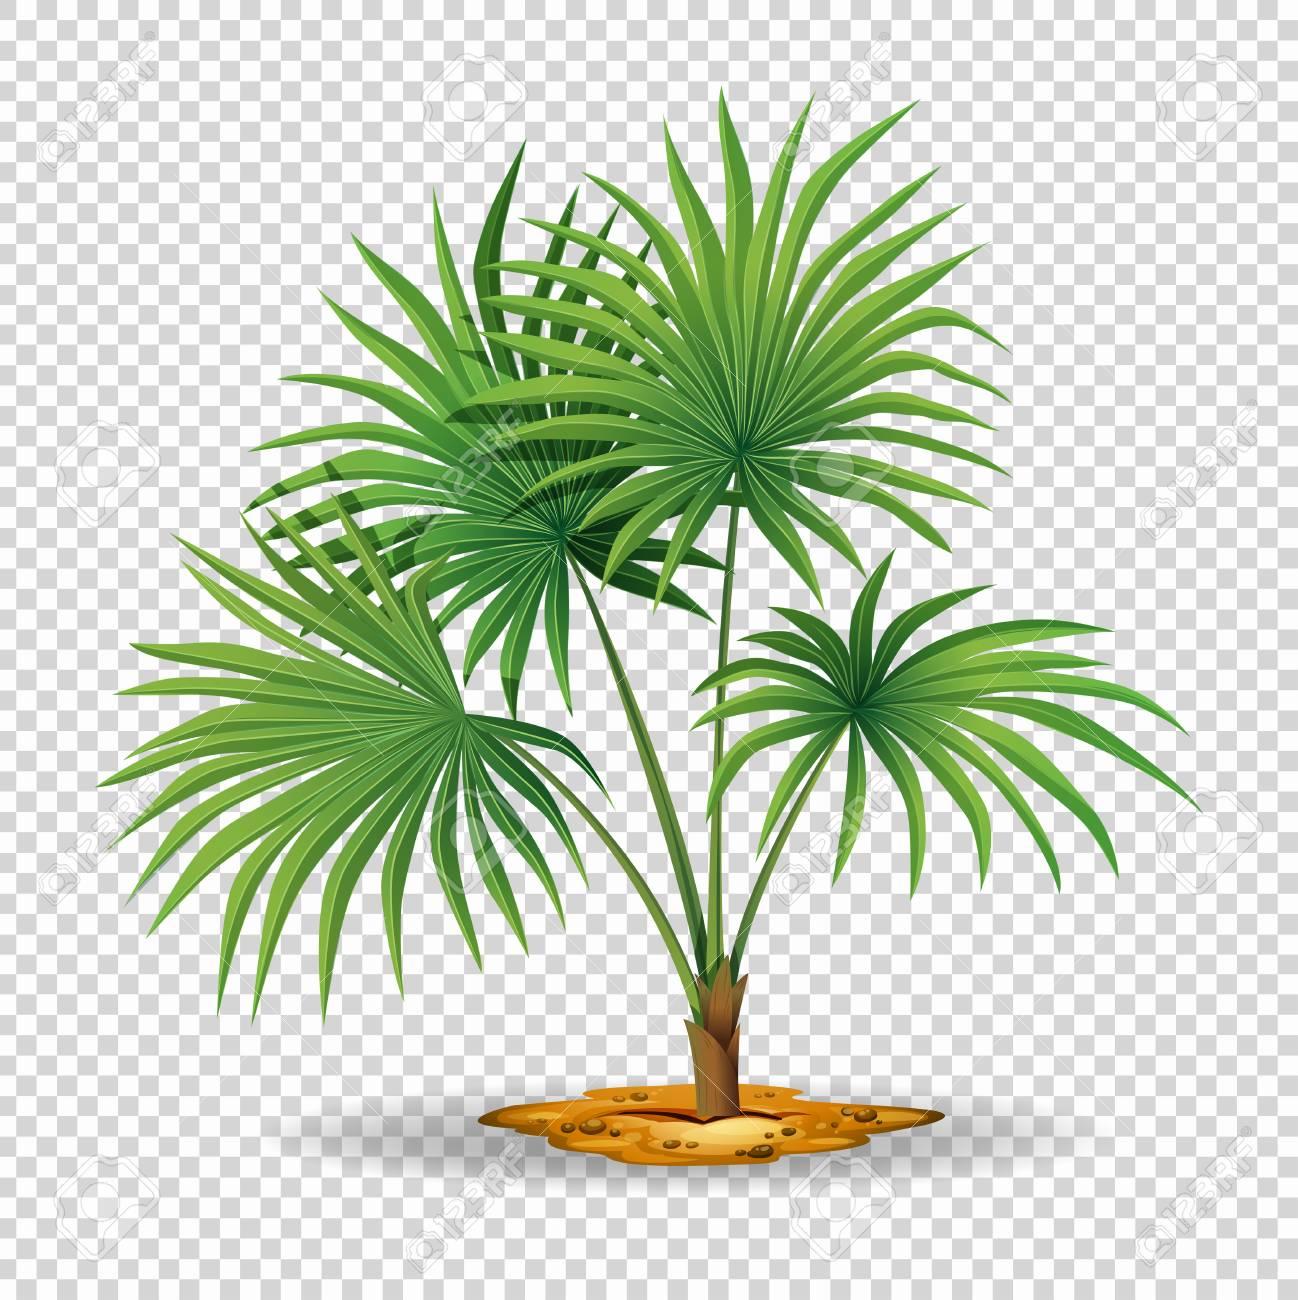 Palm tree on transparent background illustration.